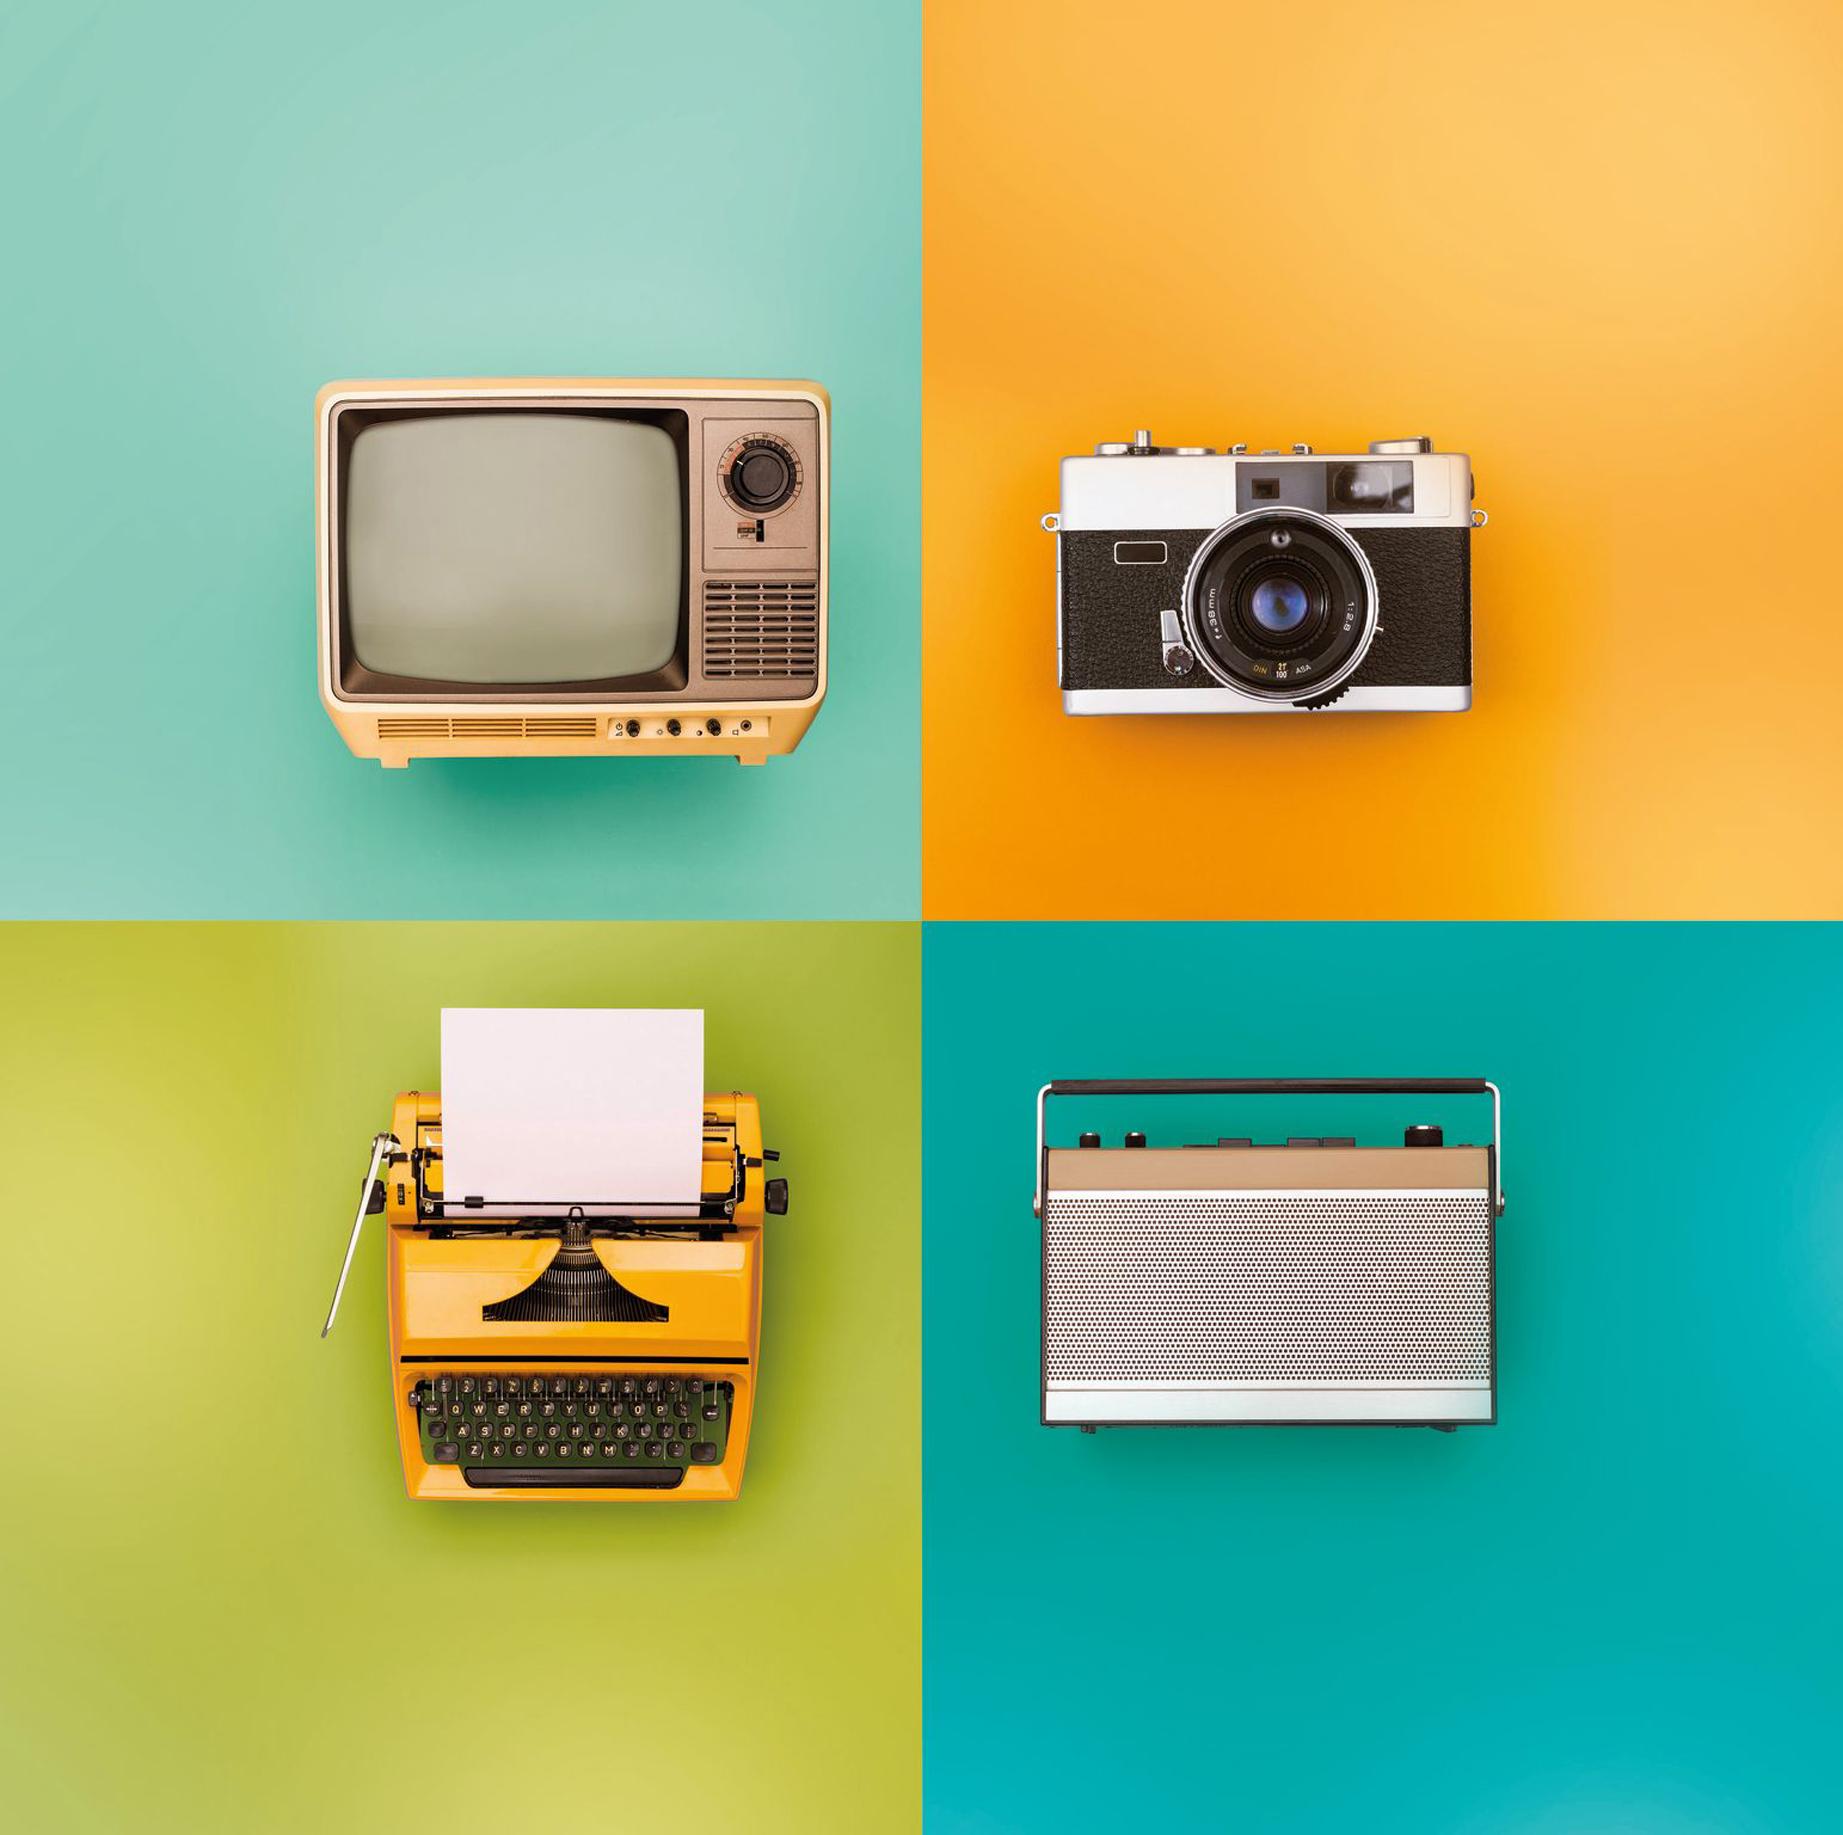 Vintage Electronics Everyday Objects Jigsaw Puzzle